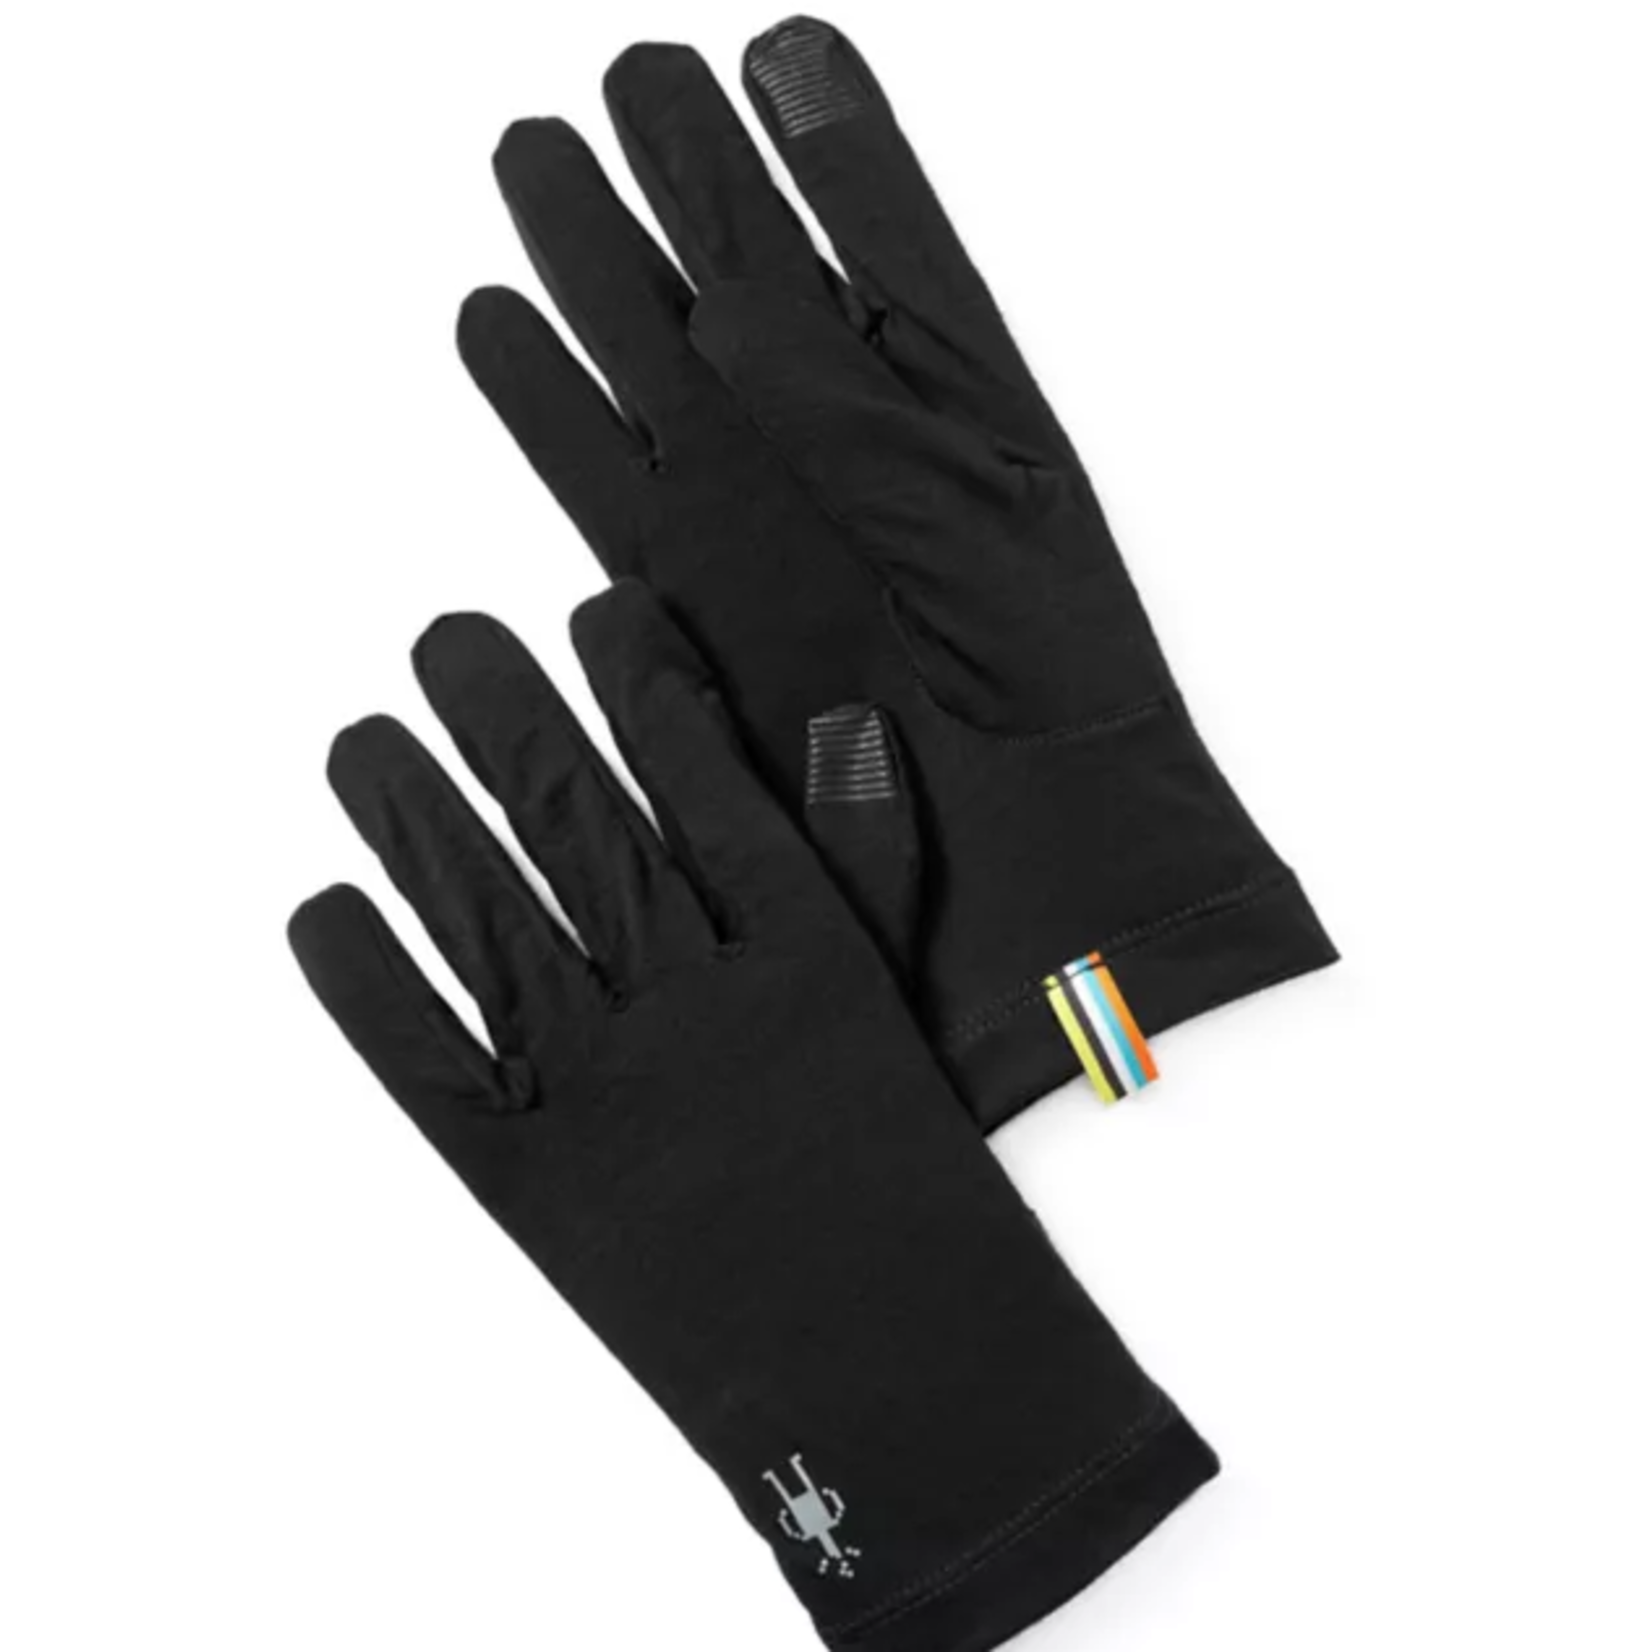 Smartwool Smartwool Merino 150 Glove